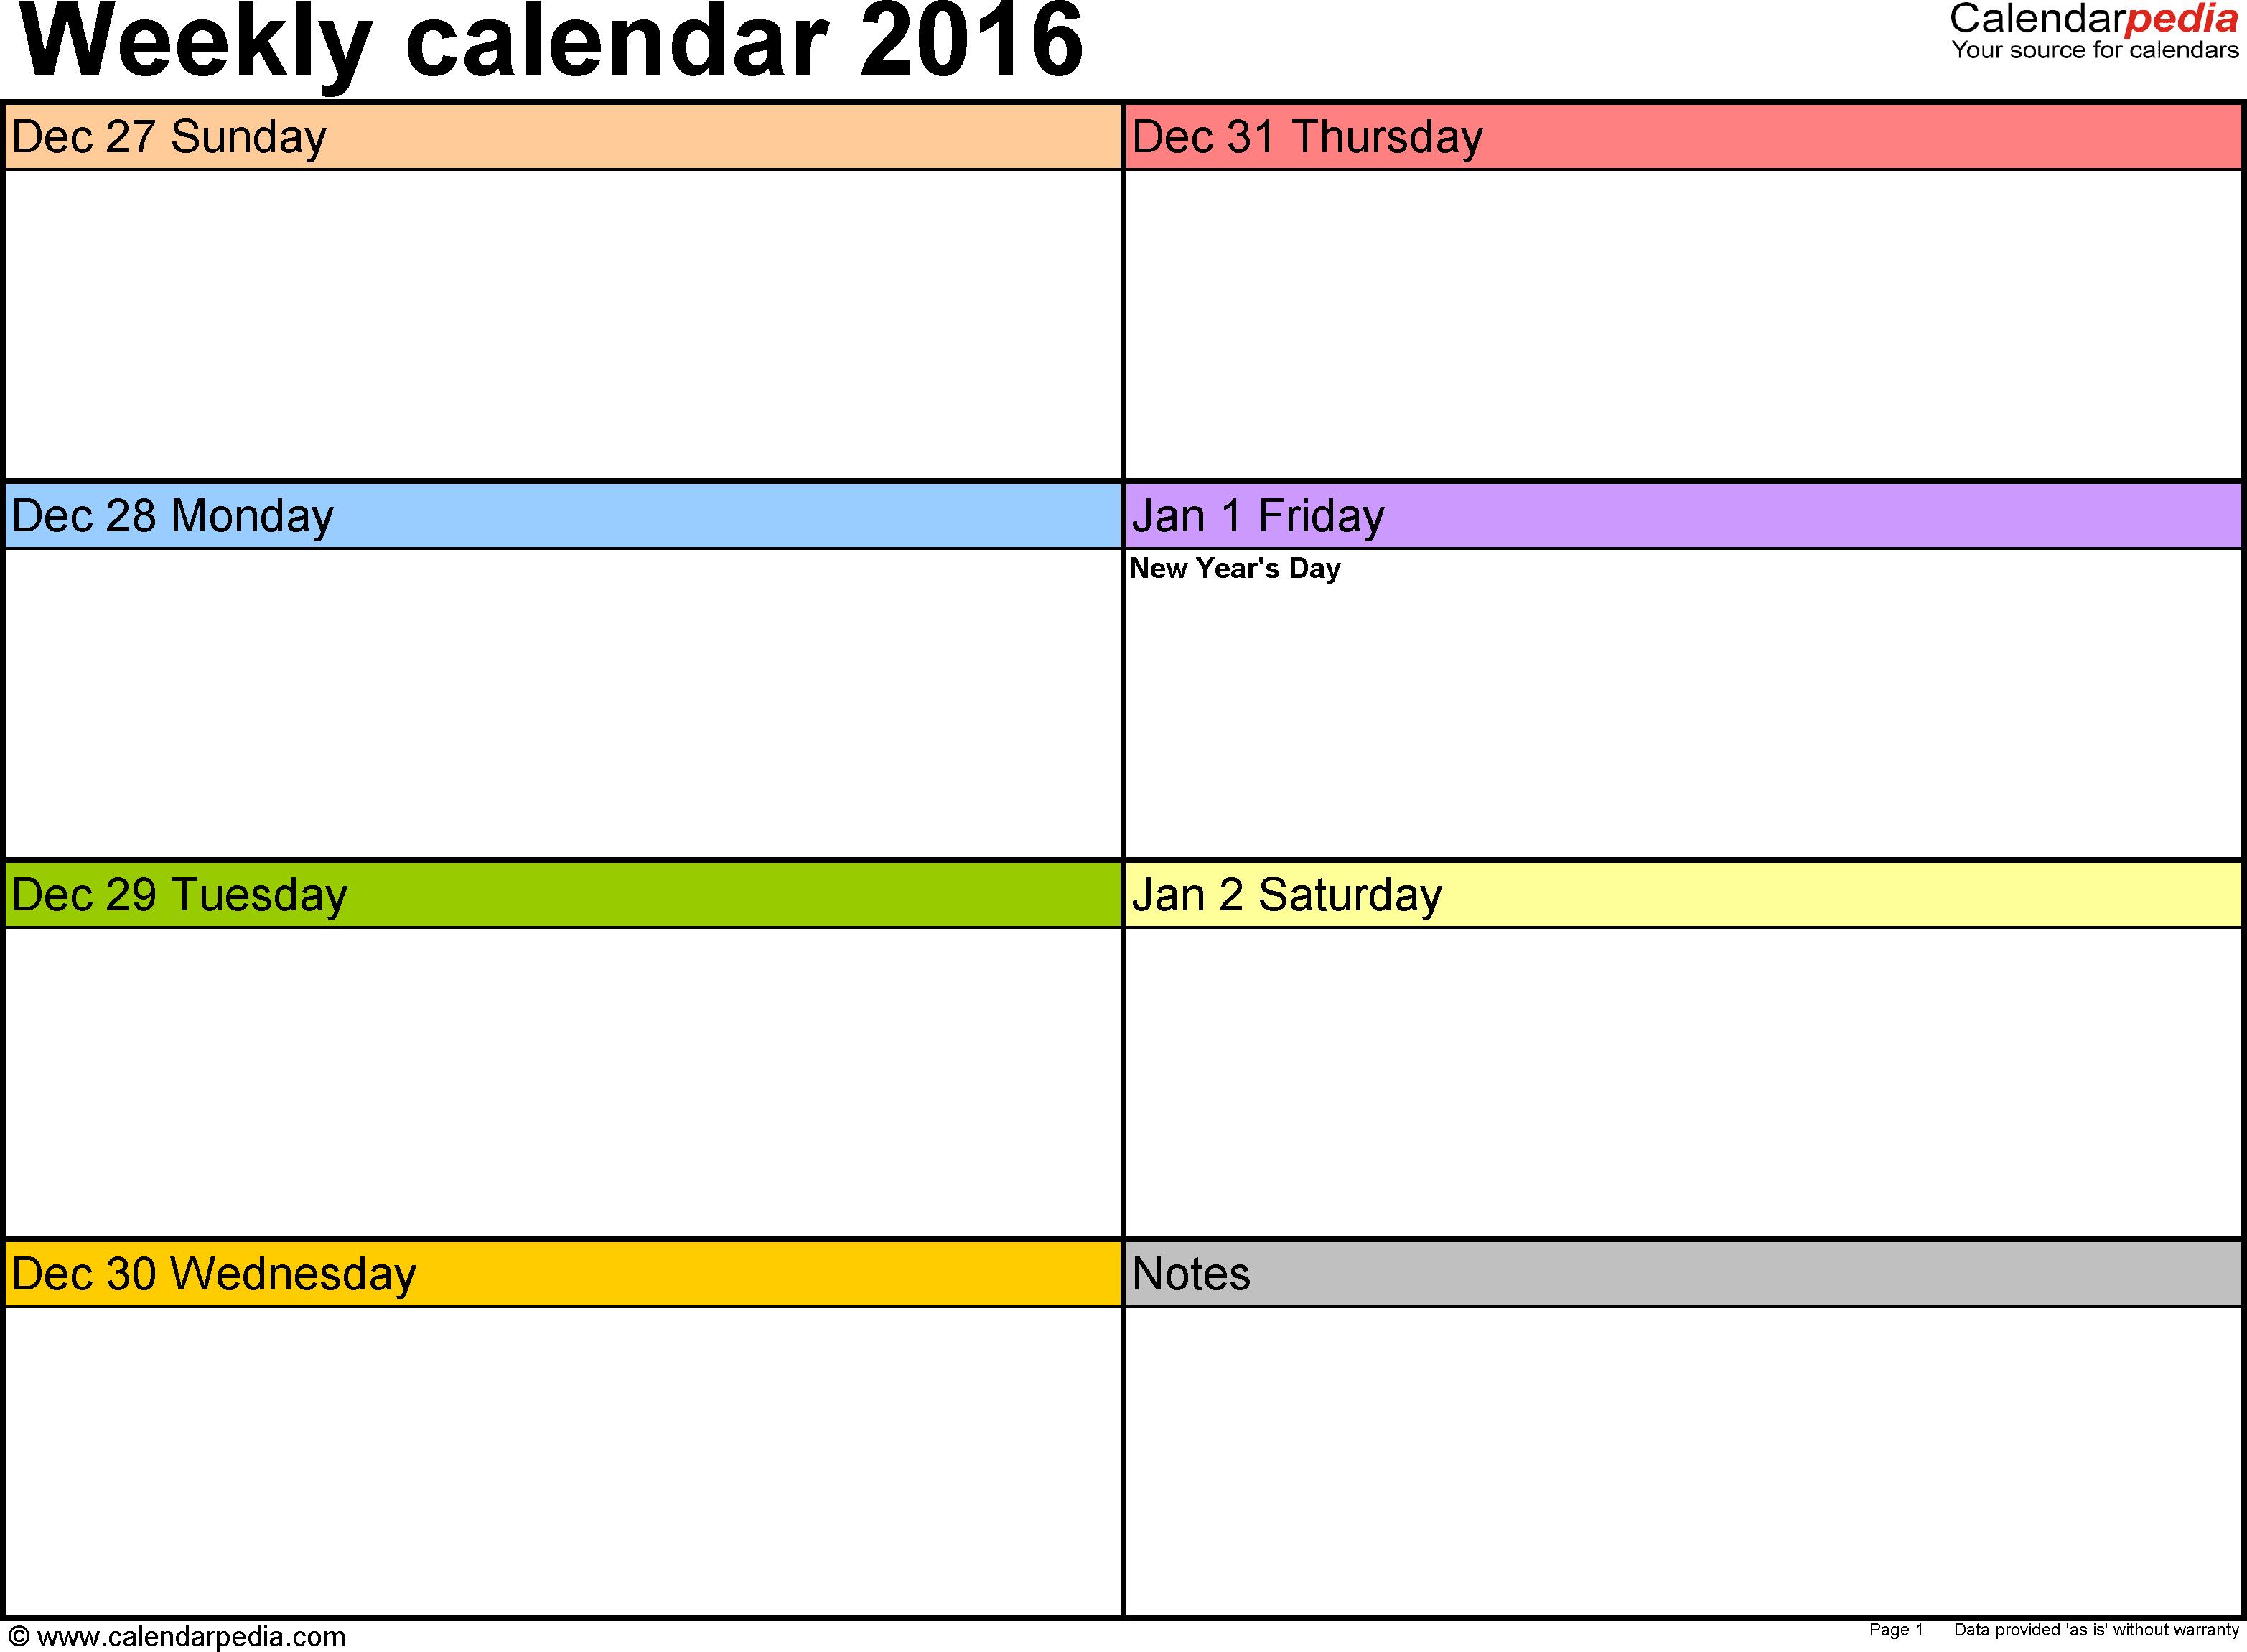 Weekly Calendar 2016 For Word - 12 Free Printable Templates inside Blank Two Week Schedule Template